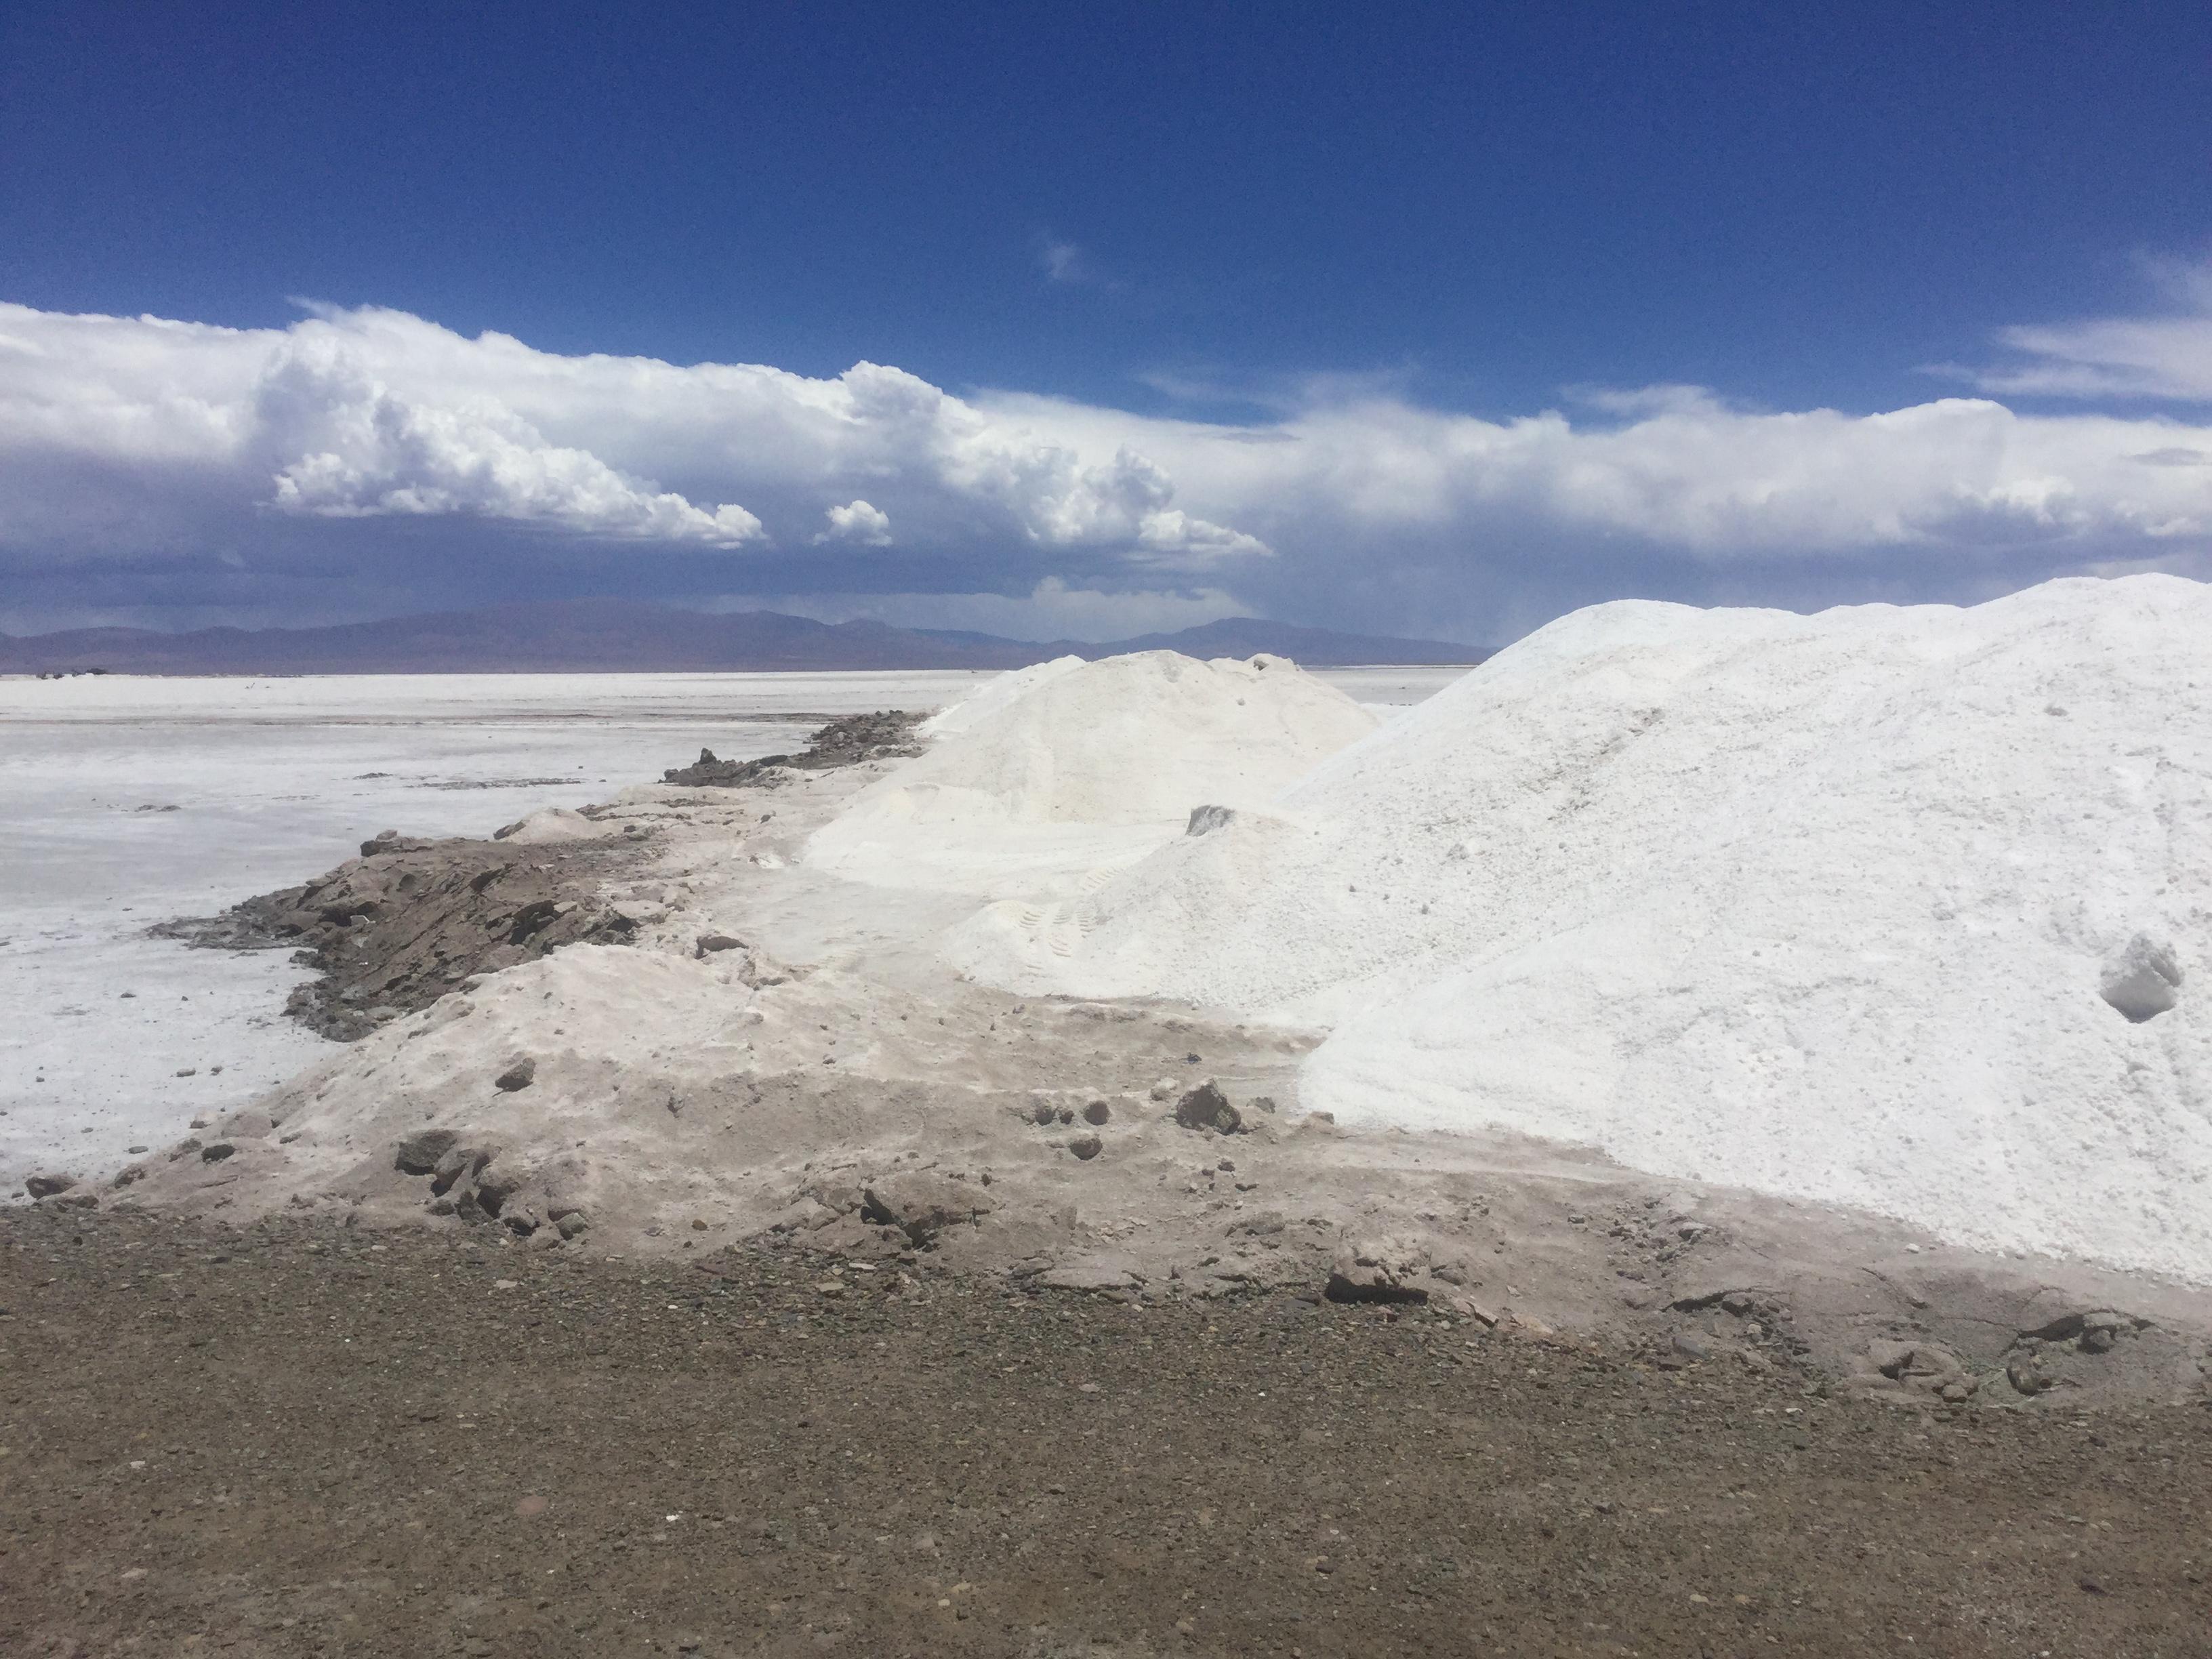 Calama, Antofagasta